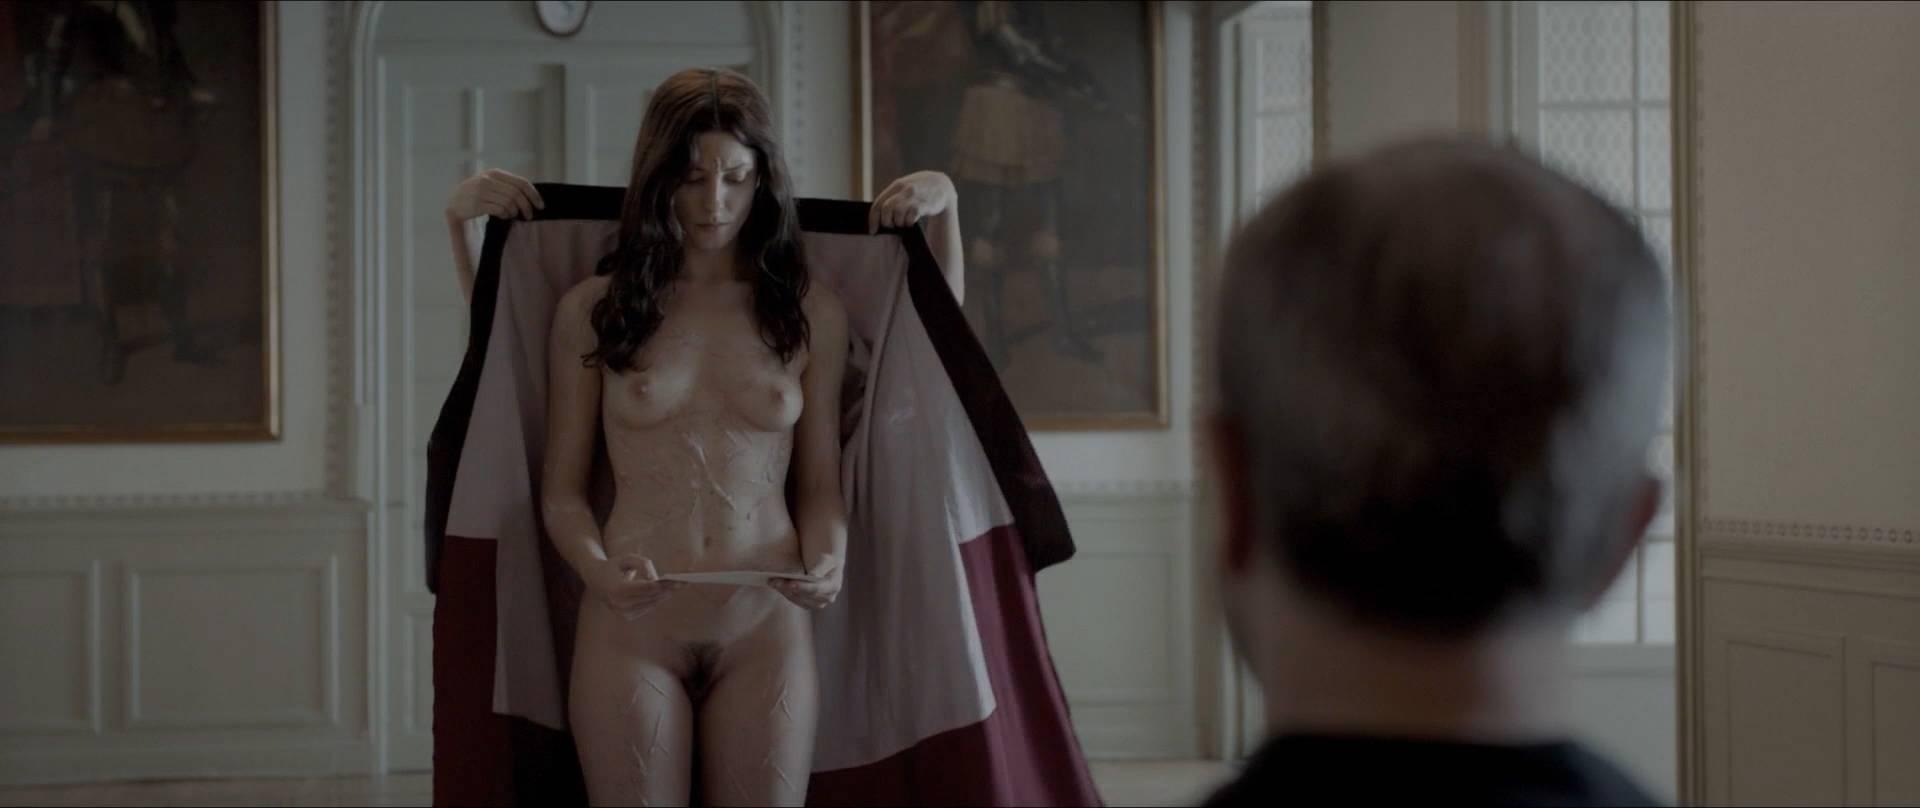 Bárbara Lennie nude full frontal - Magical Girl (ES-2014) hd080p (4)